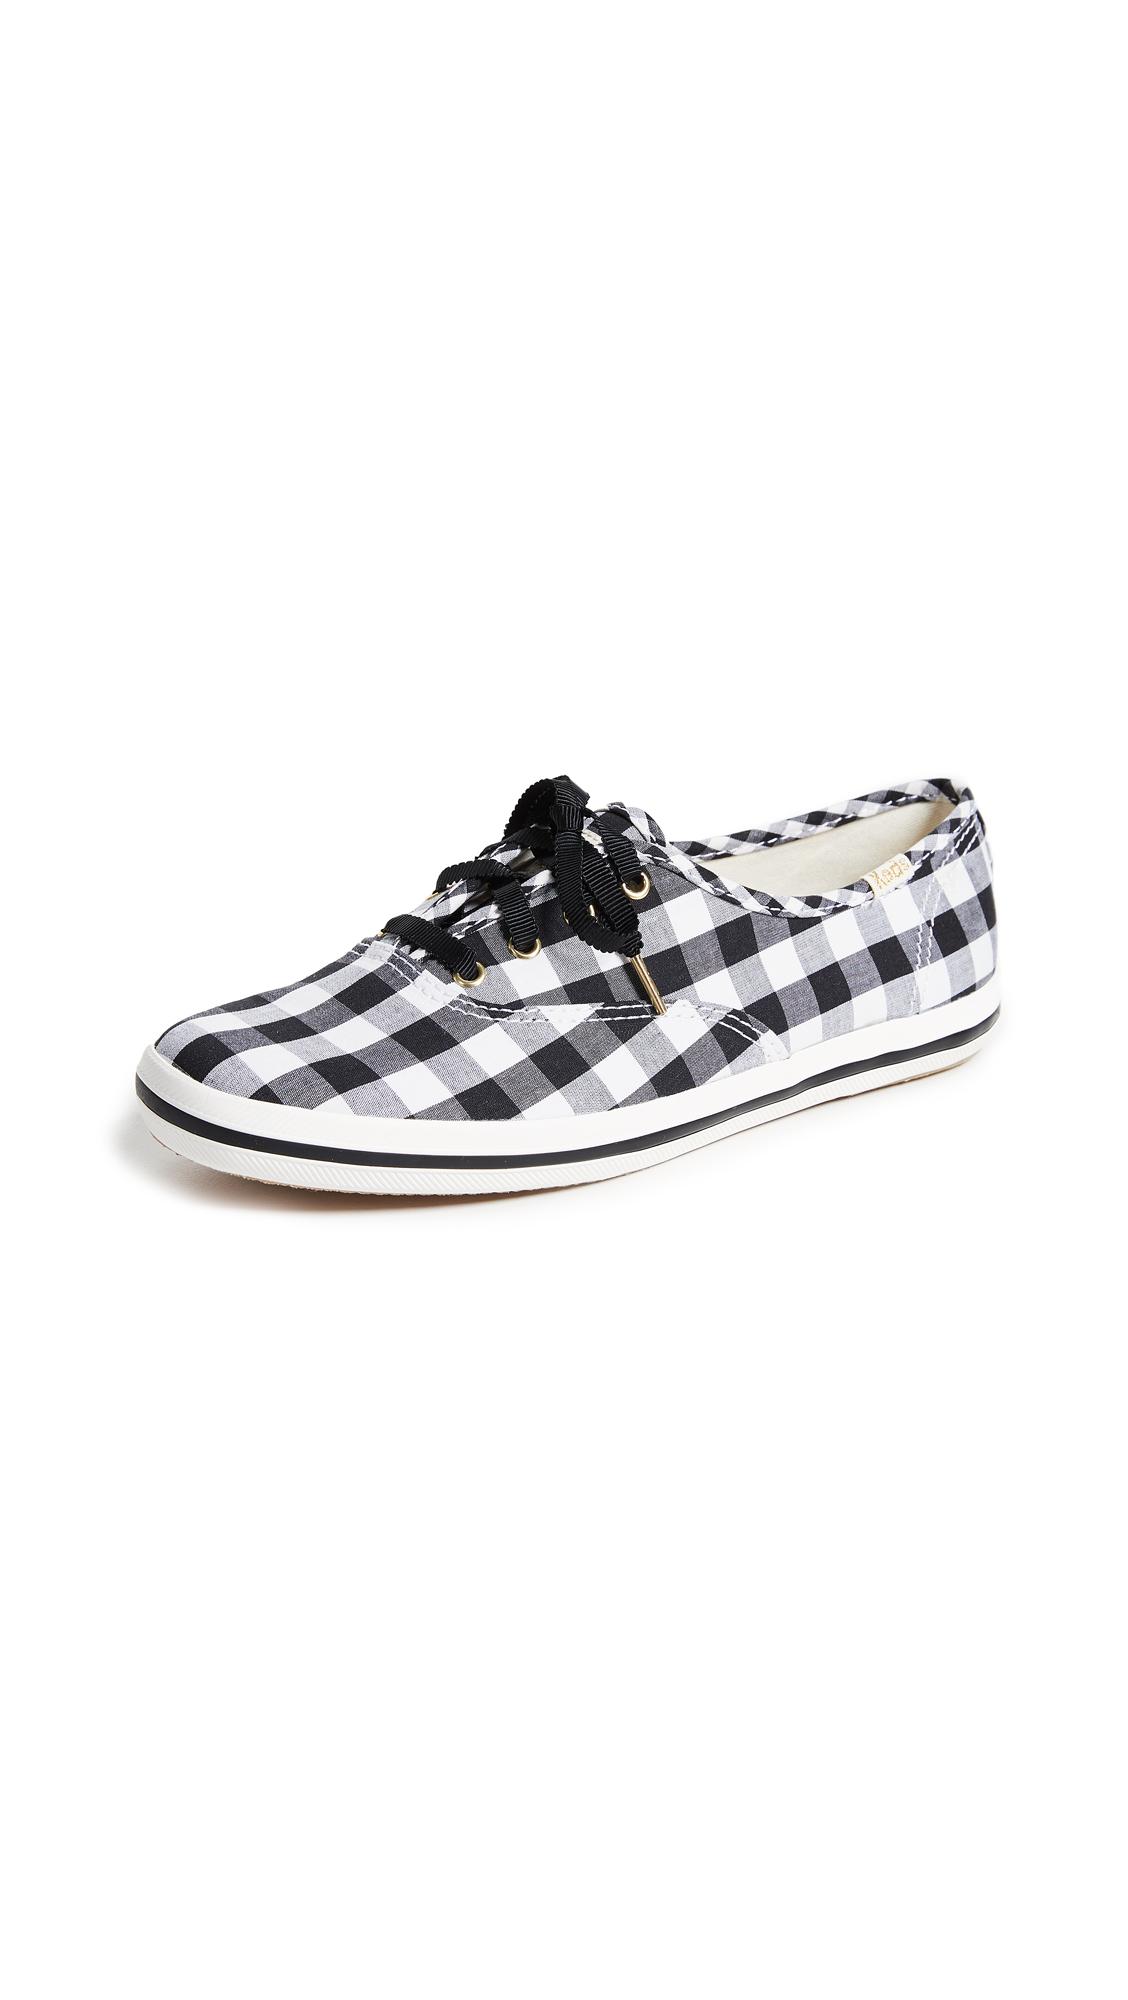 Keds x Kate Spade New York Gingham Sneakers - Black